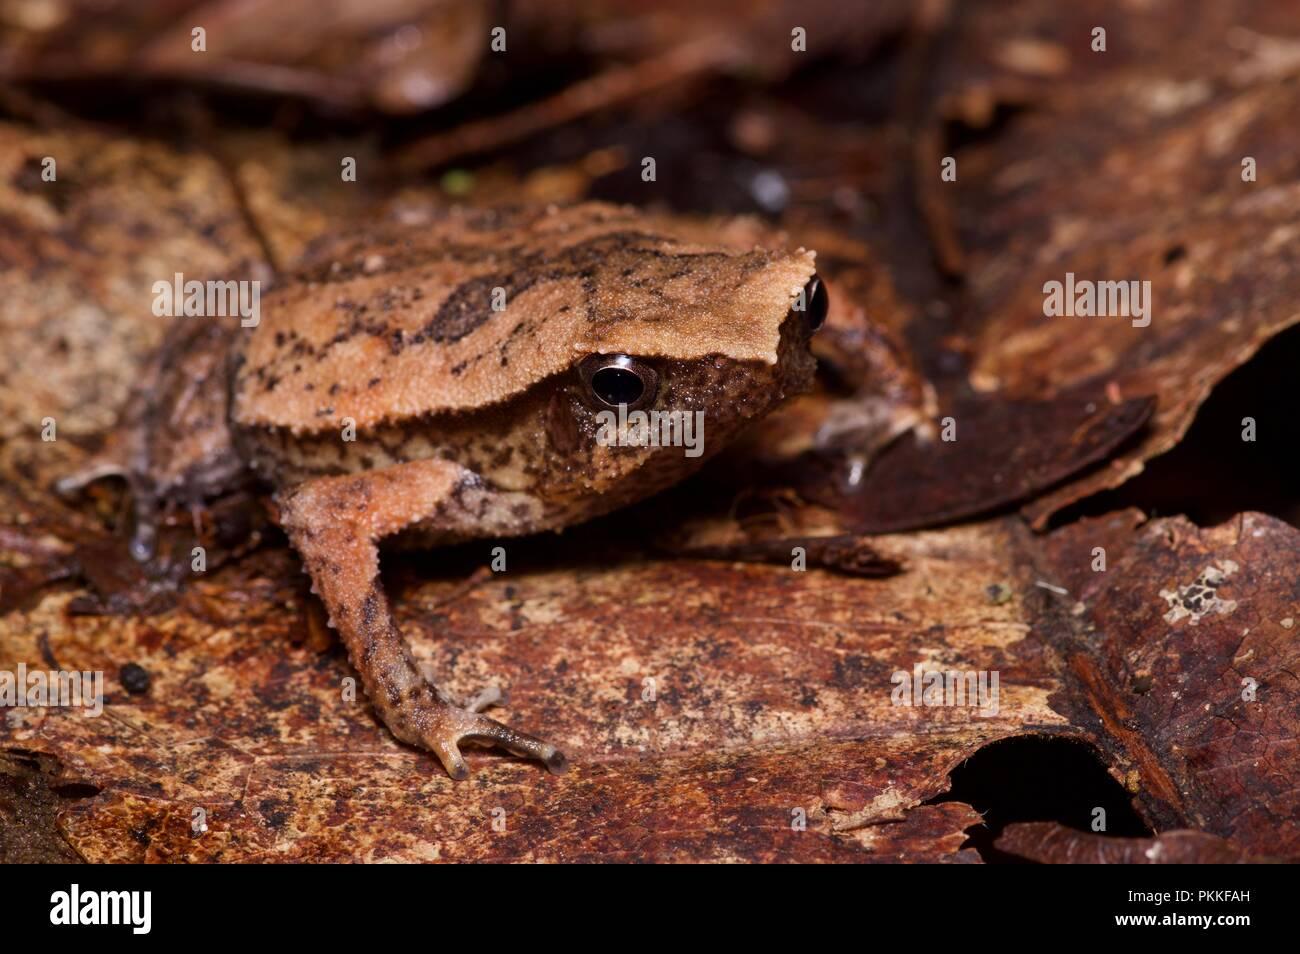 A Kinabalu Sticky Frog (Kalophrynus baluensis) in the leaf litter at Kinabalu Park, Sabah, East Malaysia, Borneo - Stock Image